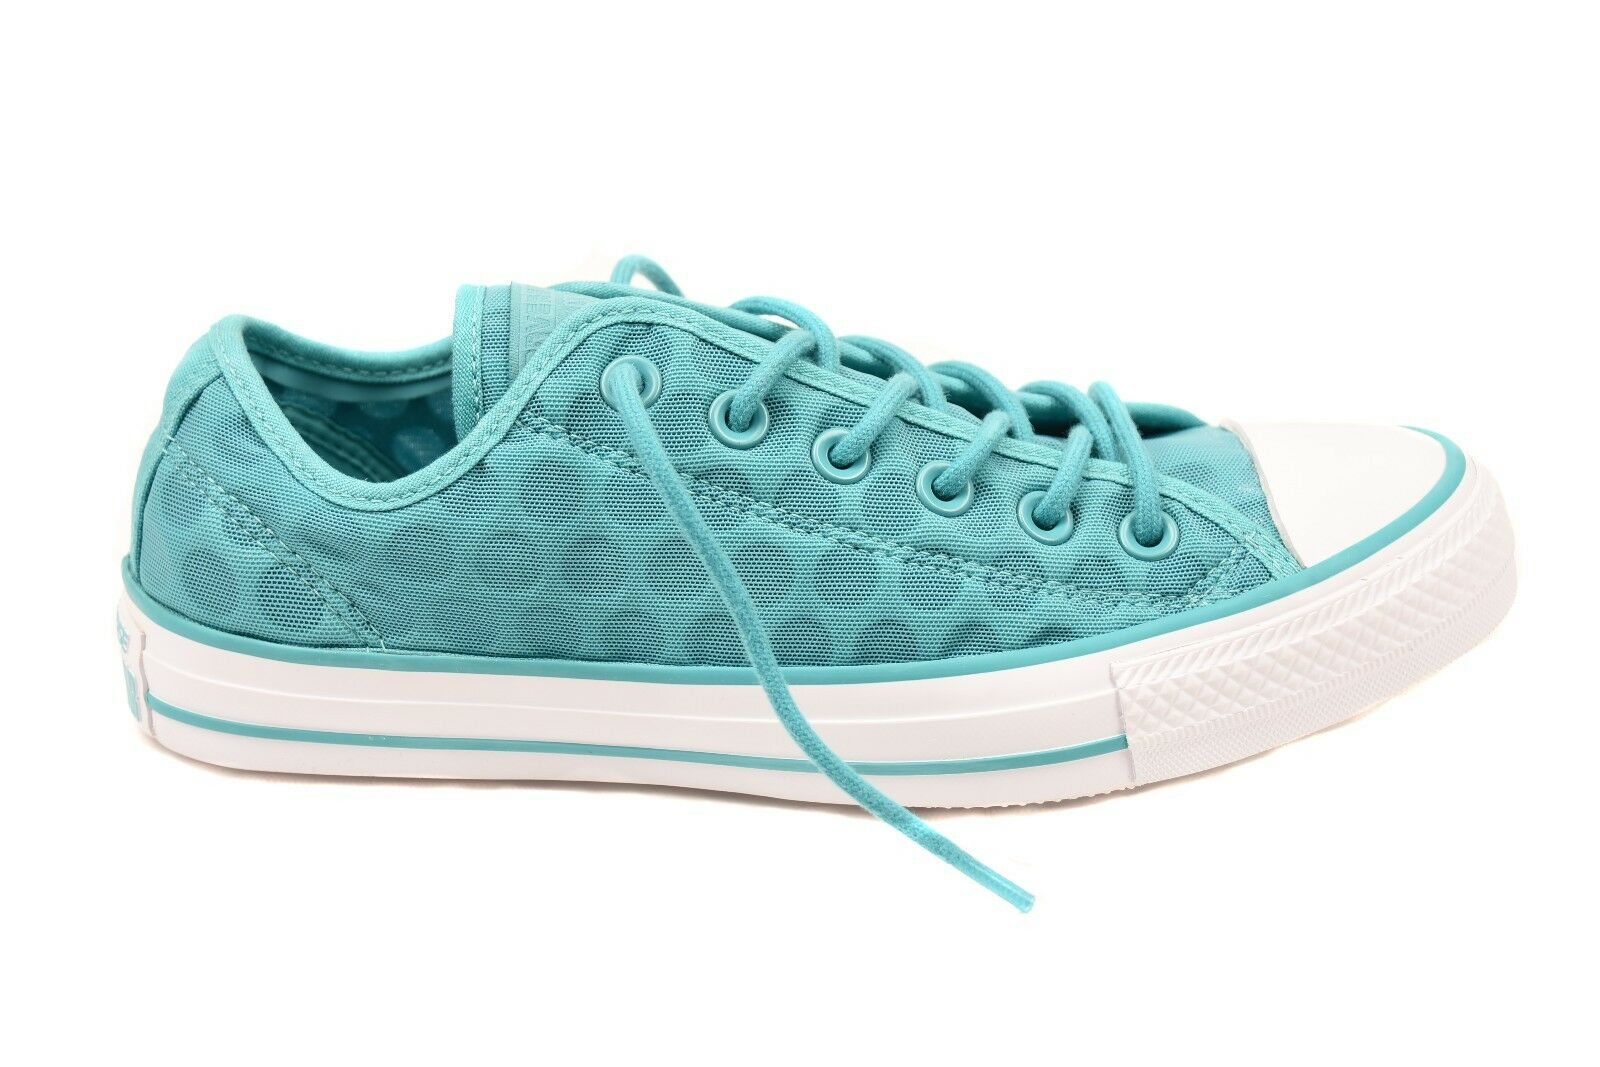 Converse Unisex CTBS OX 153925C Sneakers Begean Bqua UK 5 RRP £85 BCF74